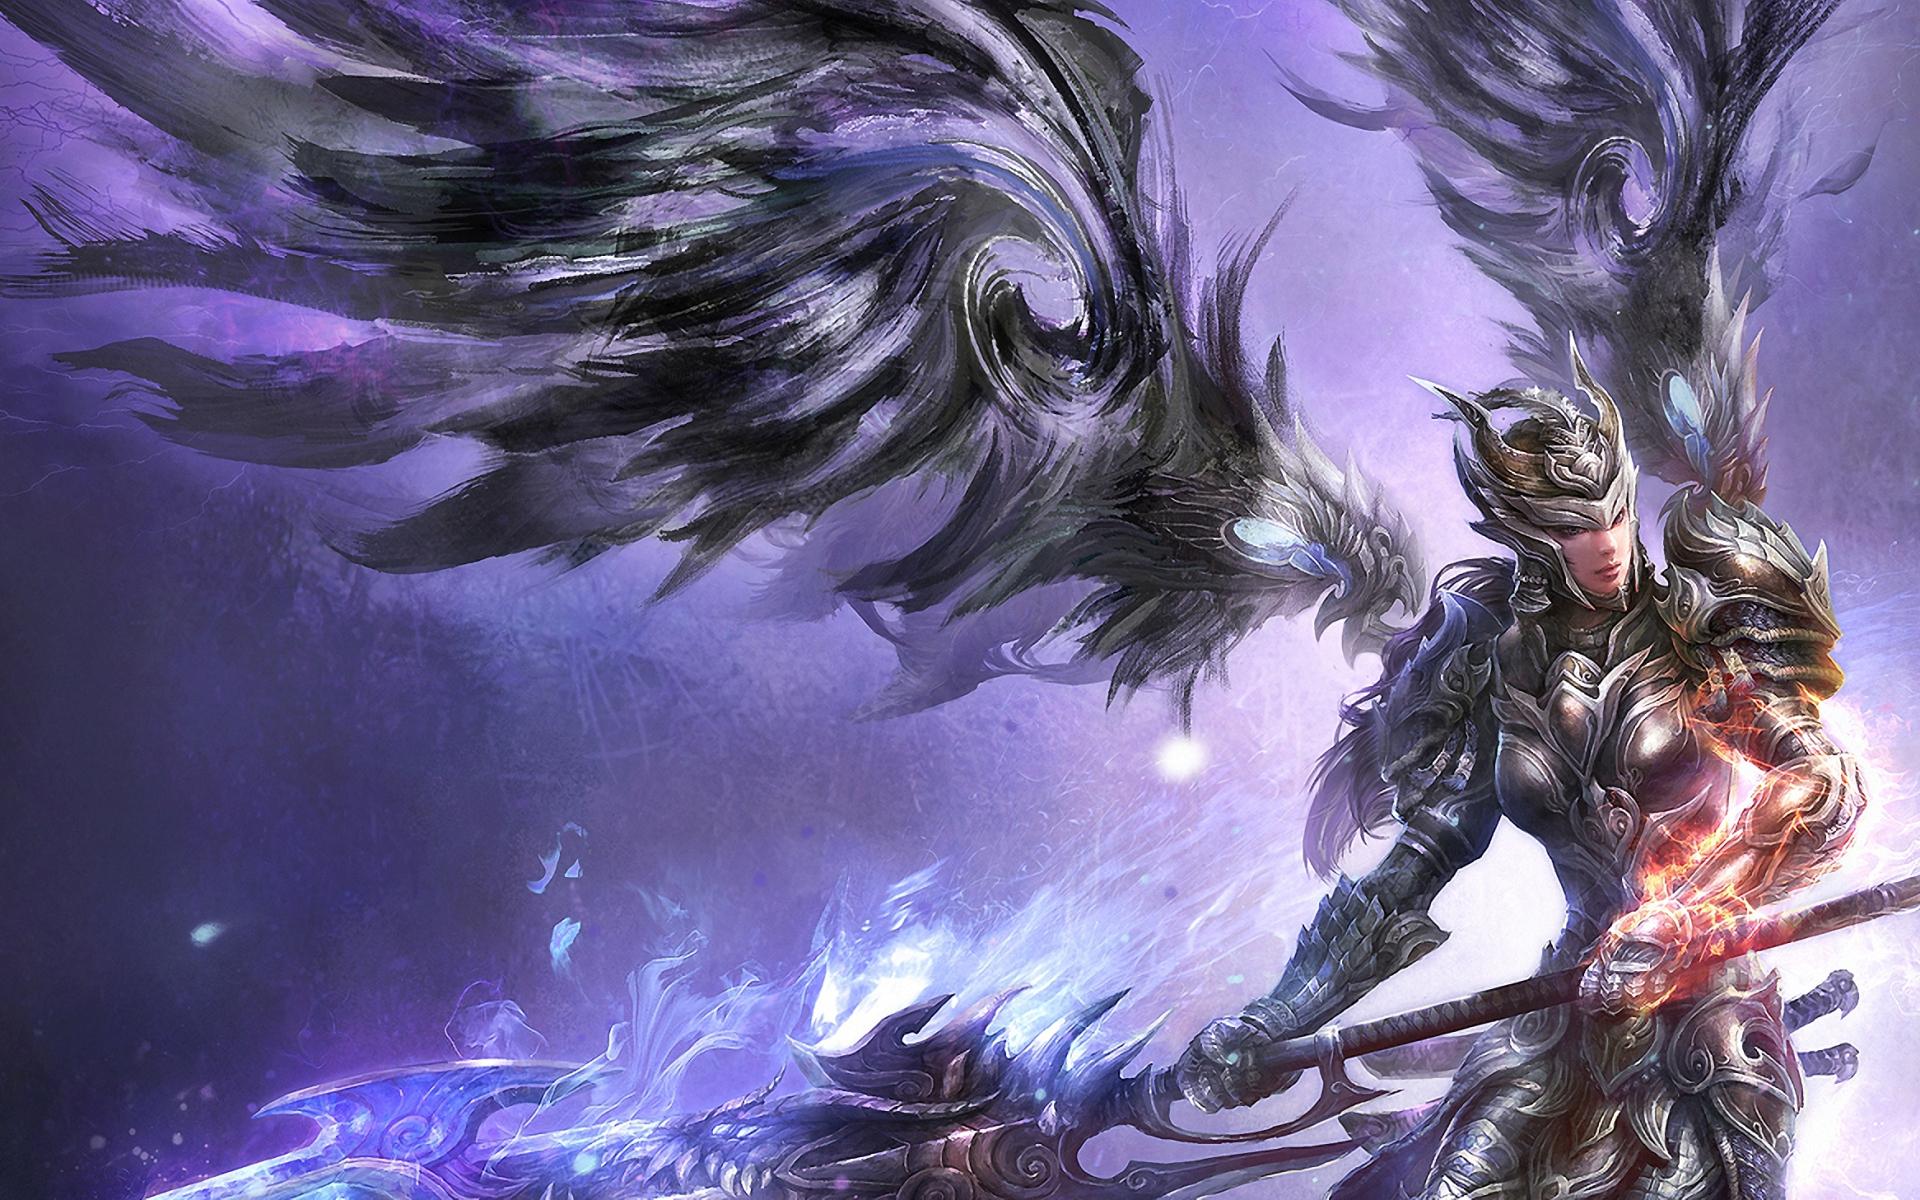 Warrior Fantasy Art Armor Angel Magic Wallpapers Hd: Angel Warrior HD Wallpaper